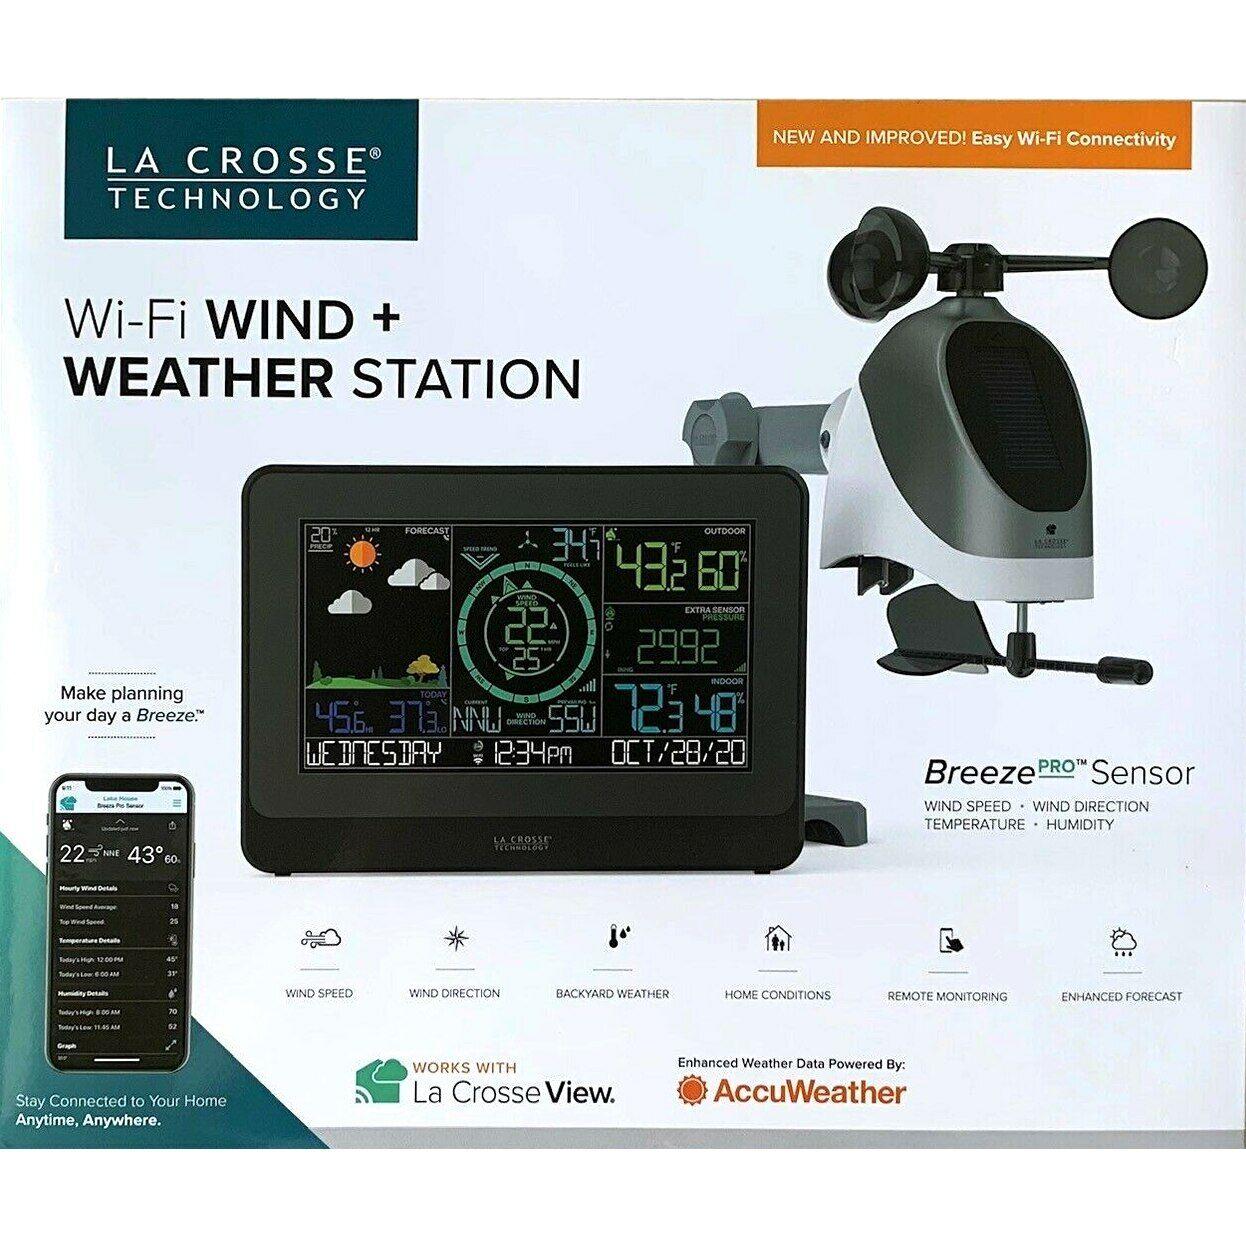 La Crosse Wireless Wi-Fi Wind & Weather Station with Breeze Pro Sensor